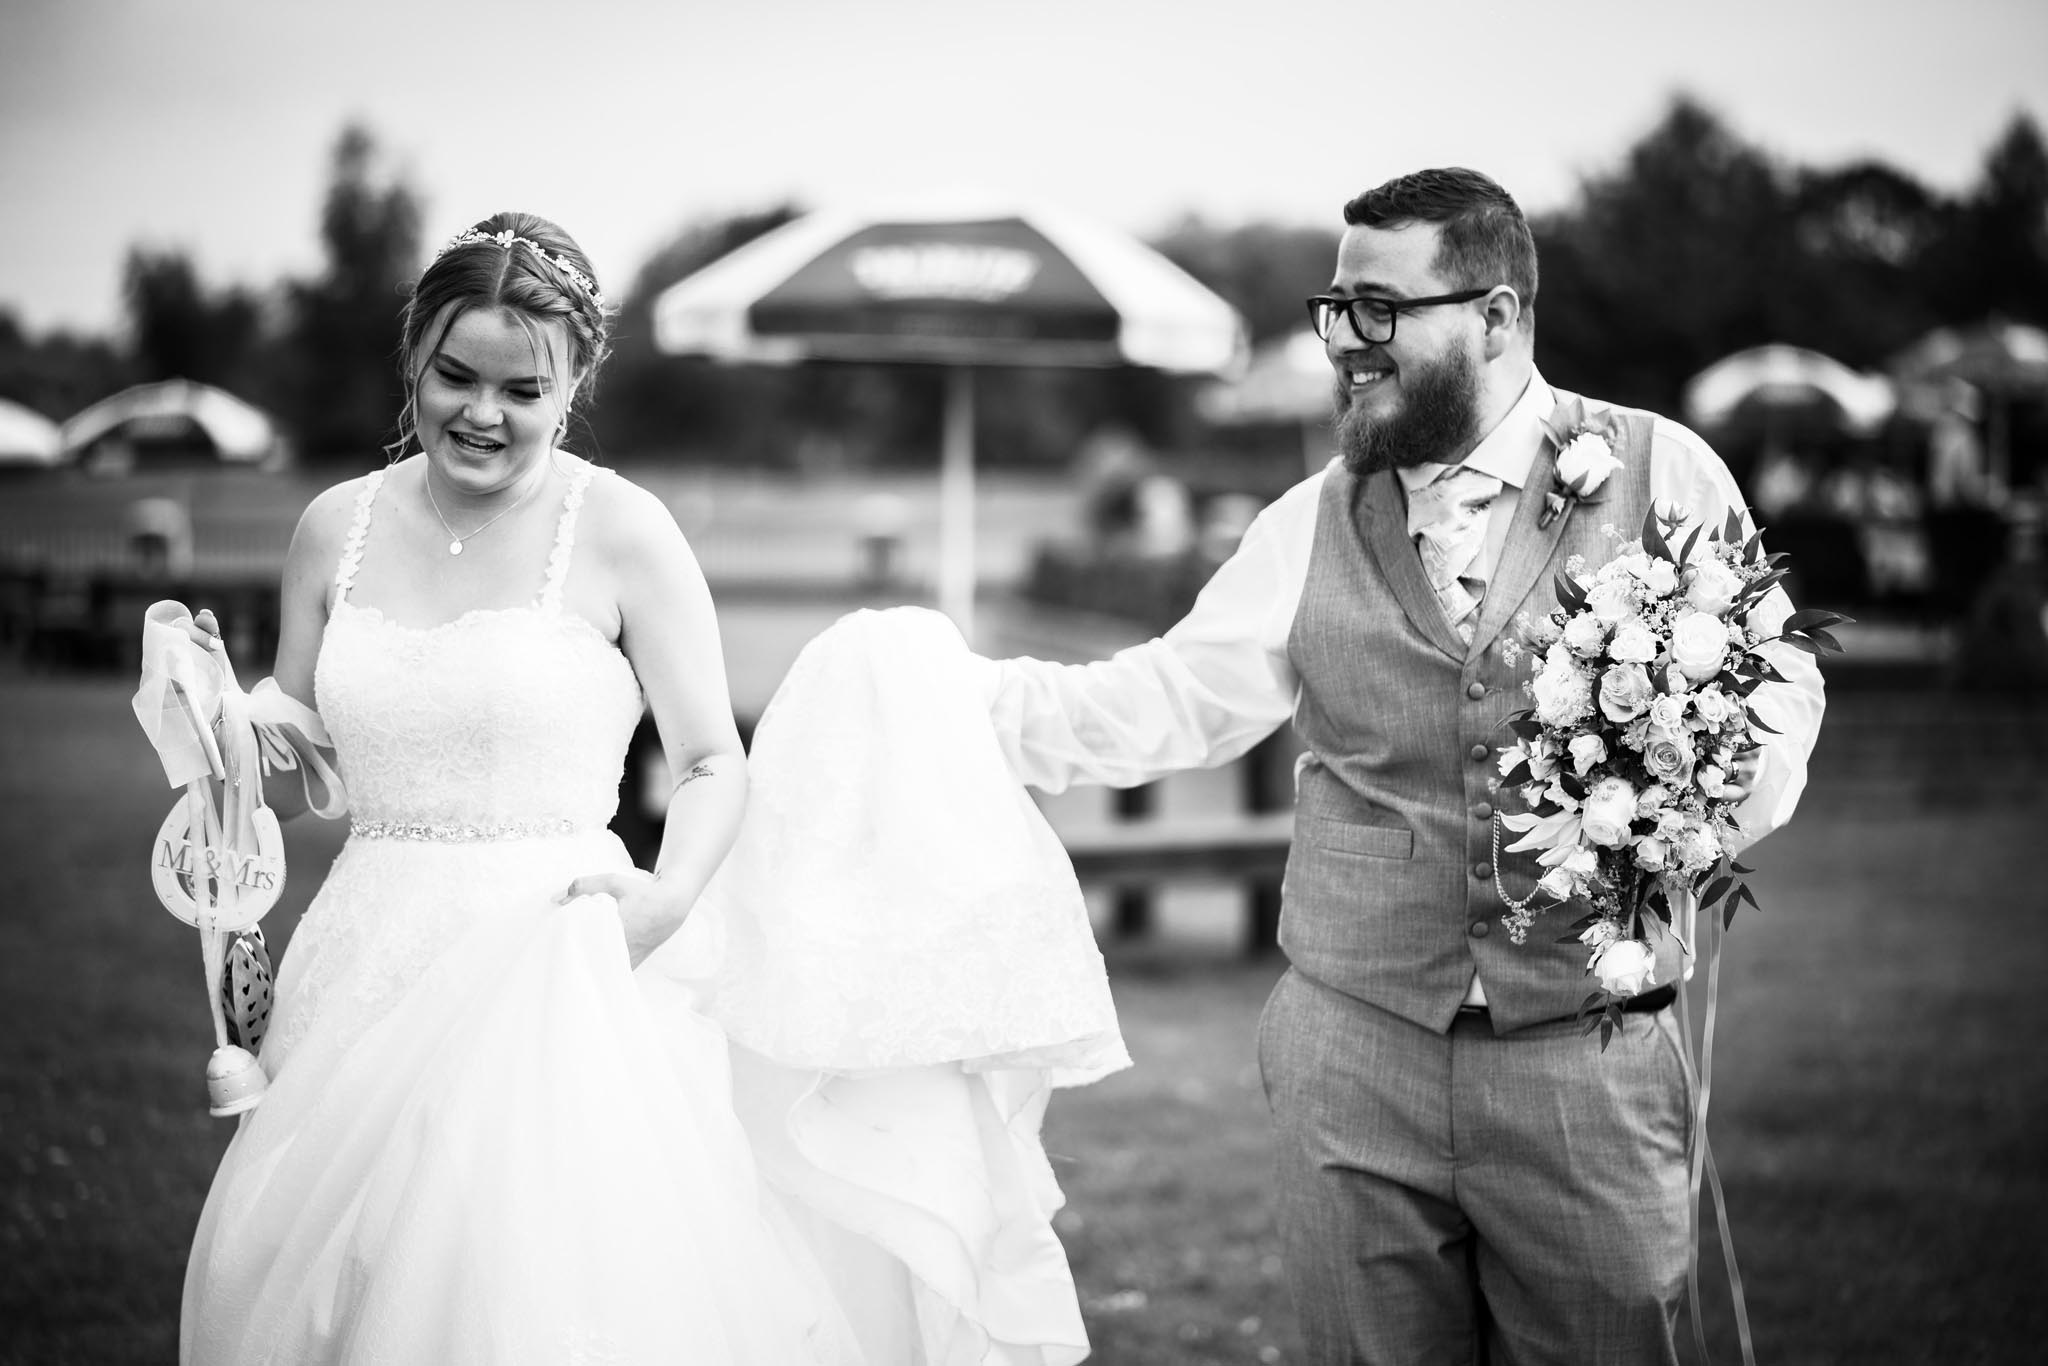 525-Bride-groom-Luke-Yasmin-The-Rayleigh-Club-Wedding-Photography.jpg